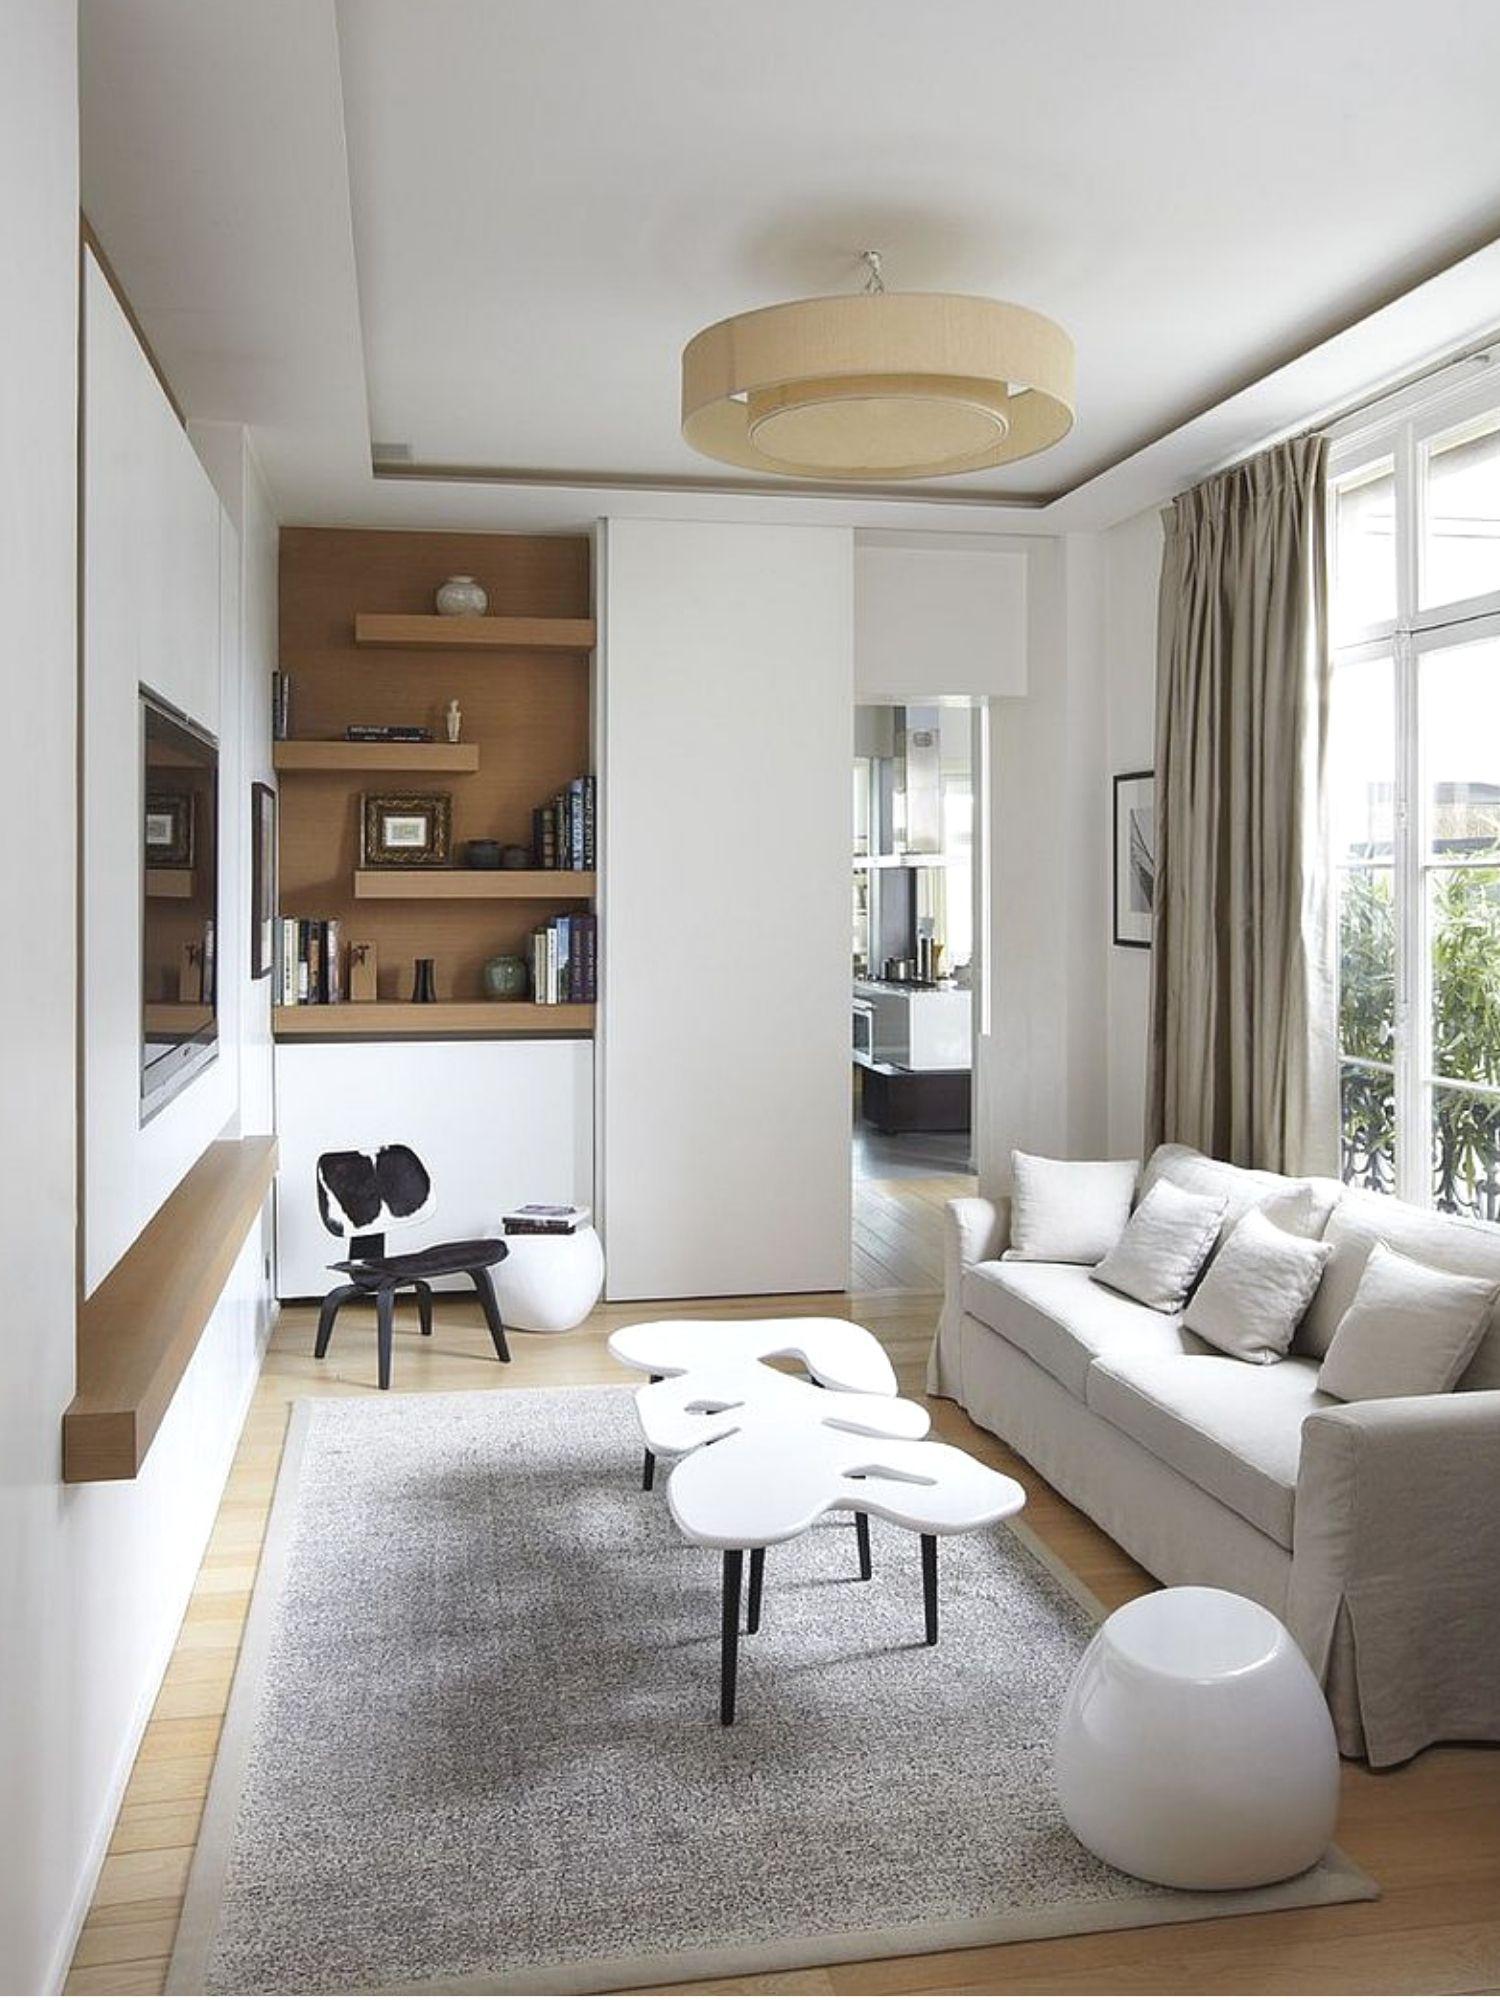 Urban Modern Interior Design For Your Home Diy Living Room